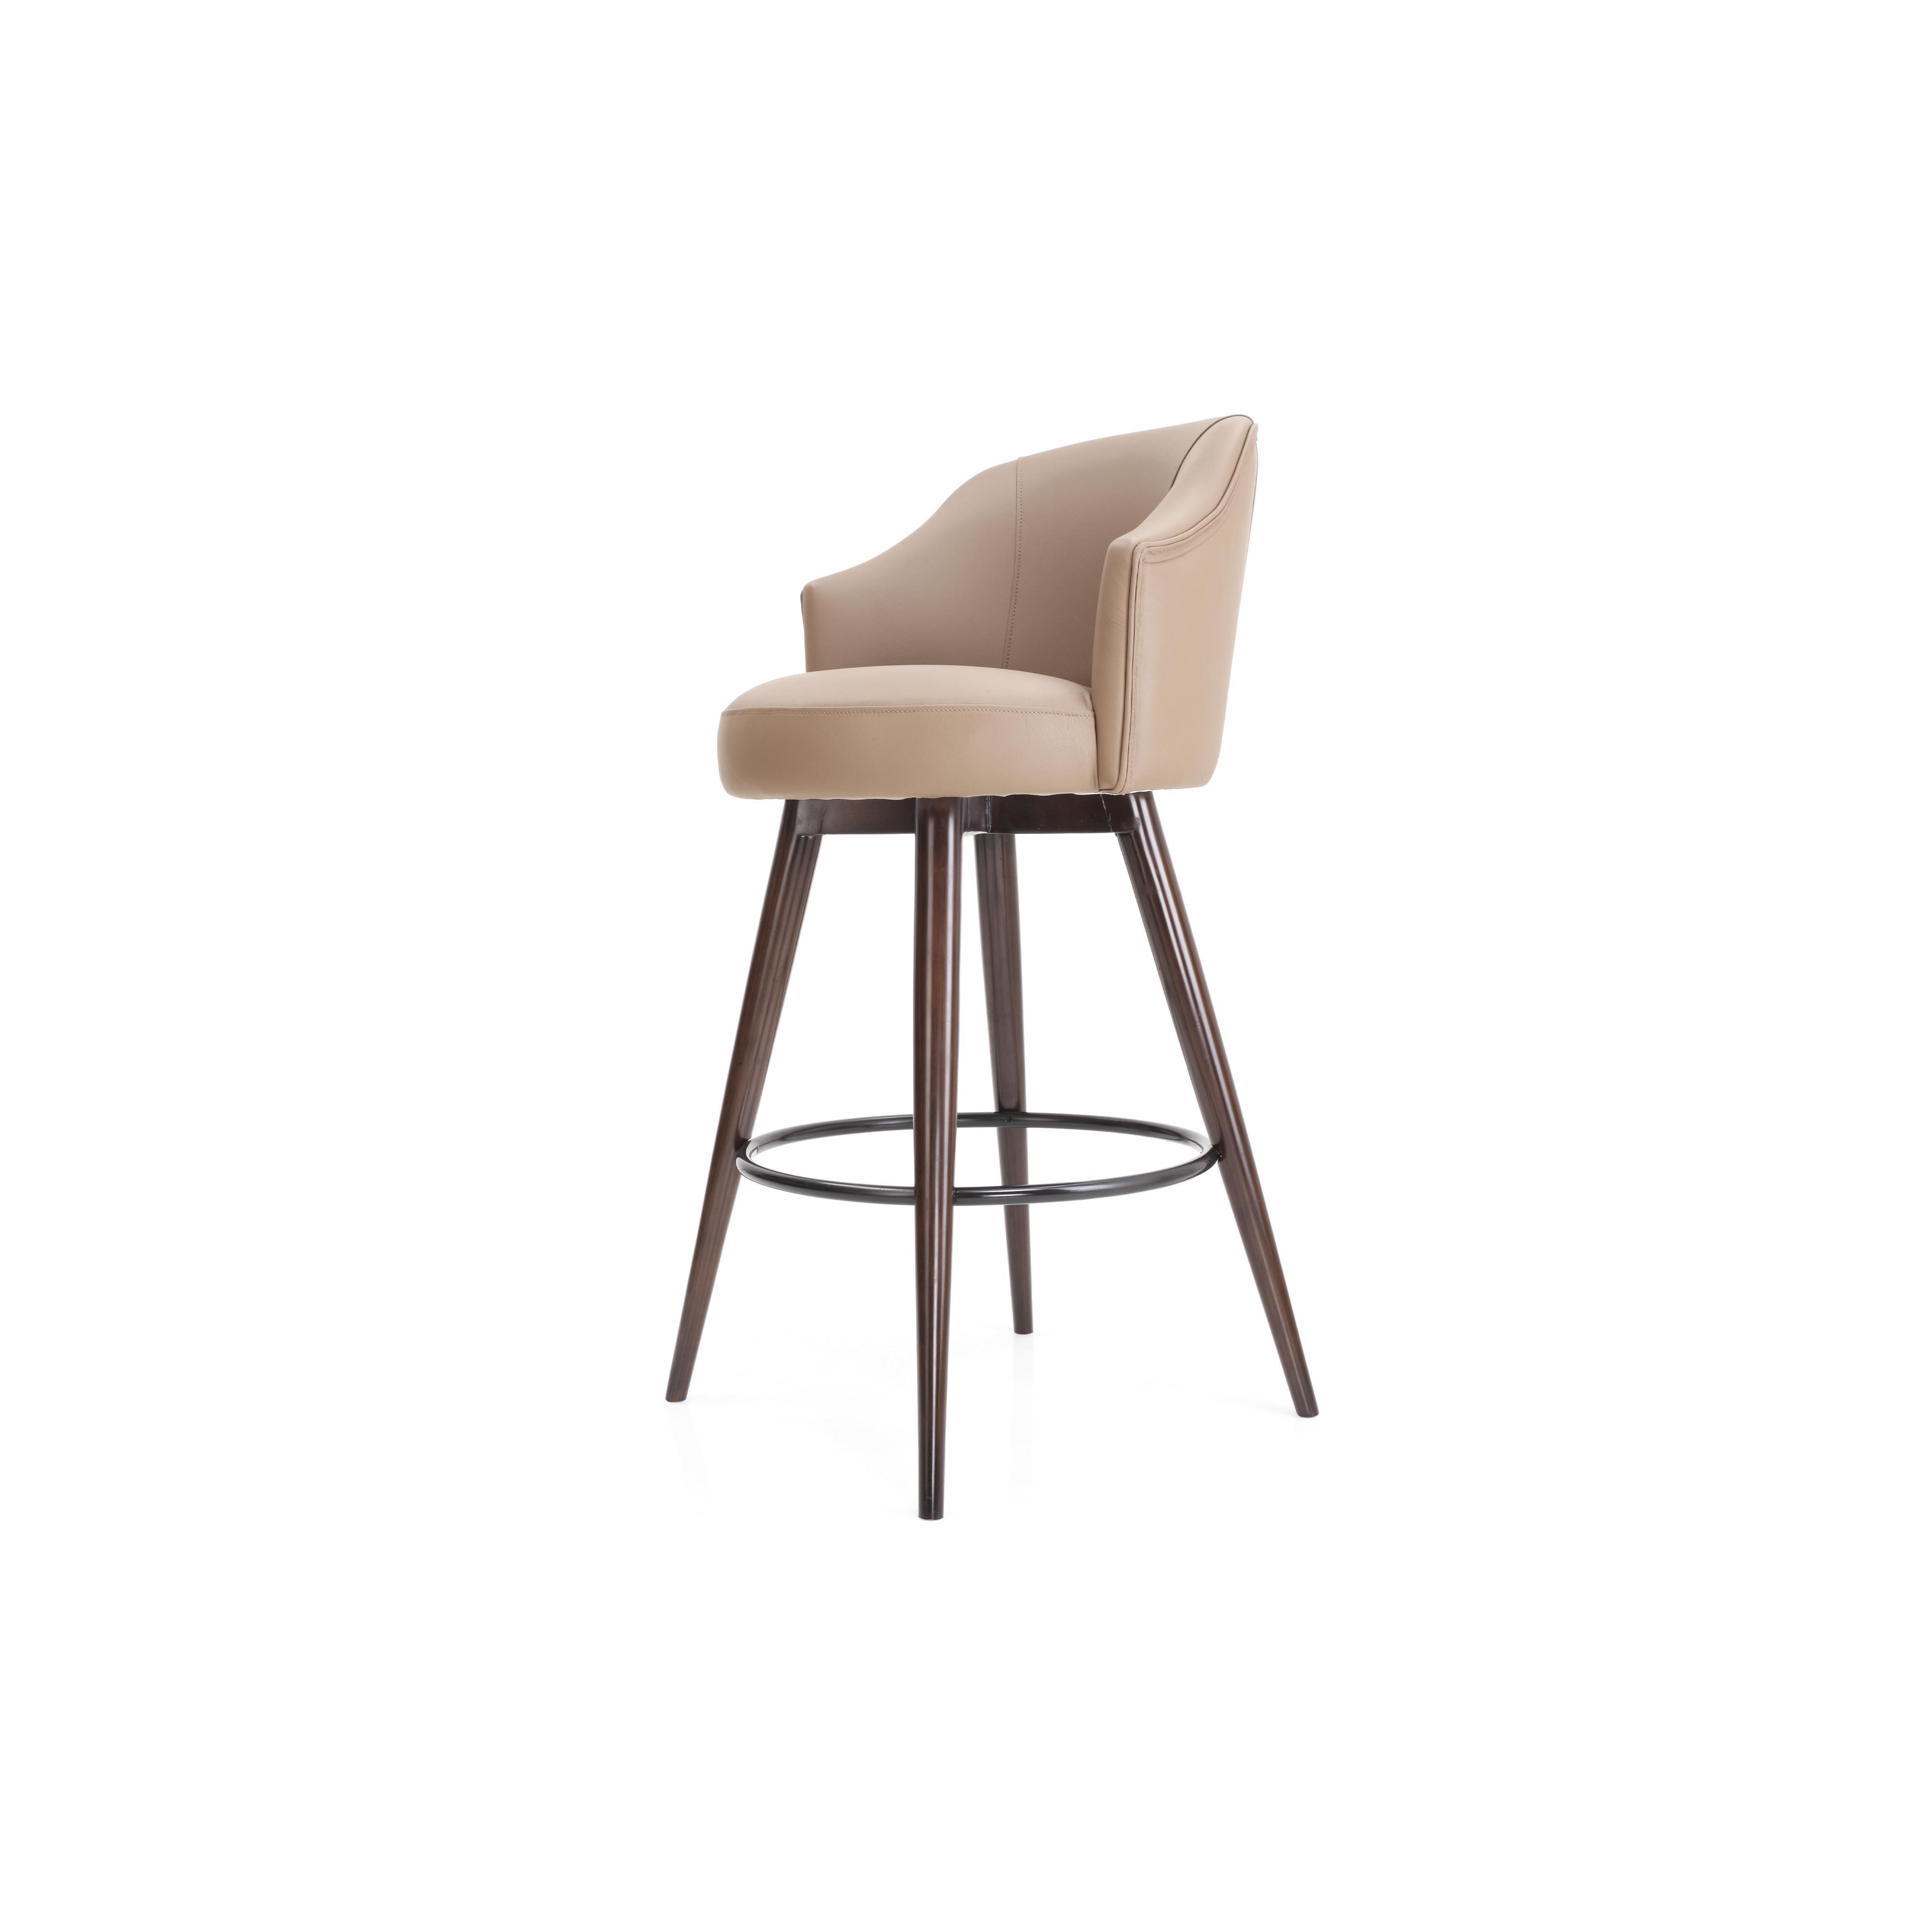 Highbury bar chair